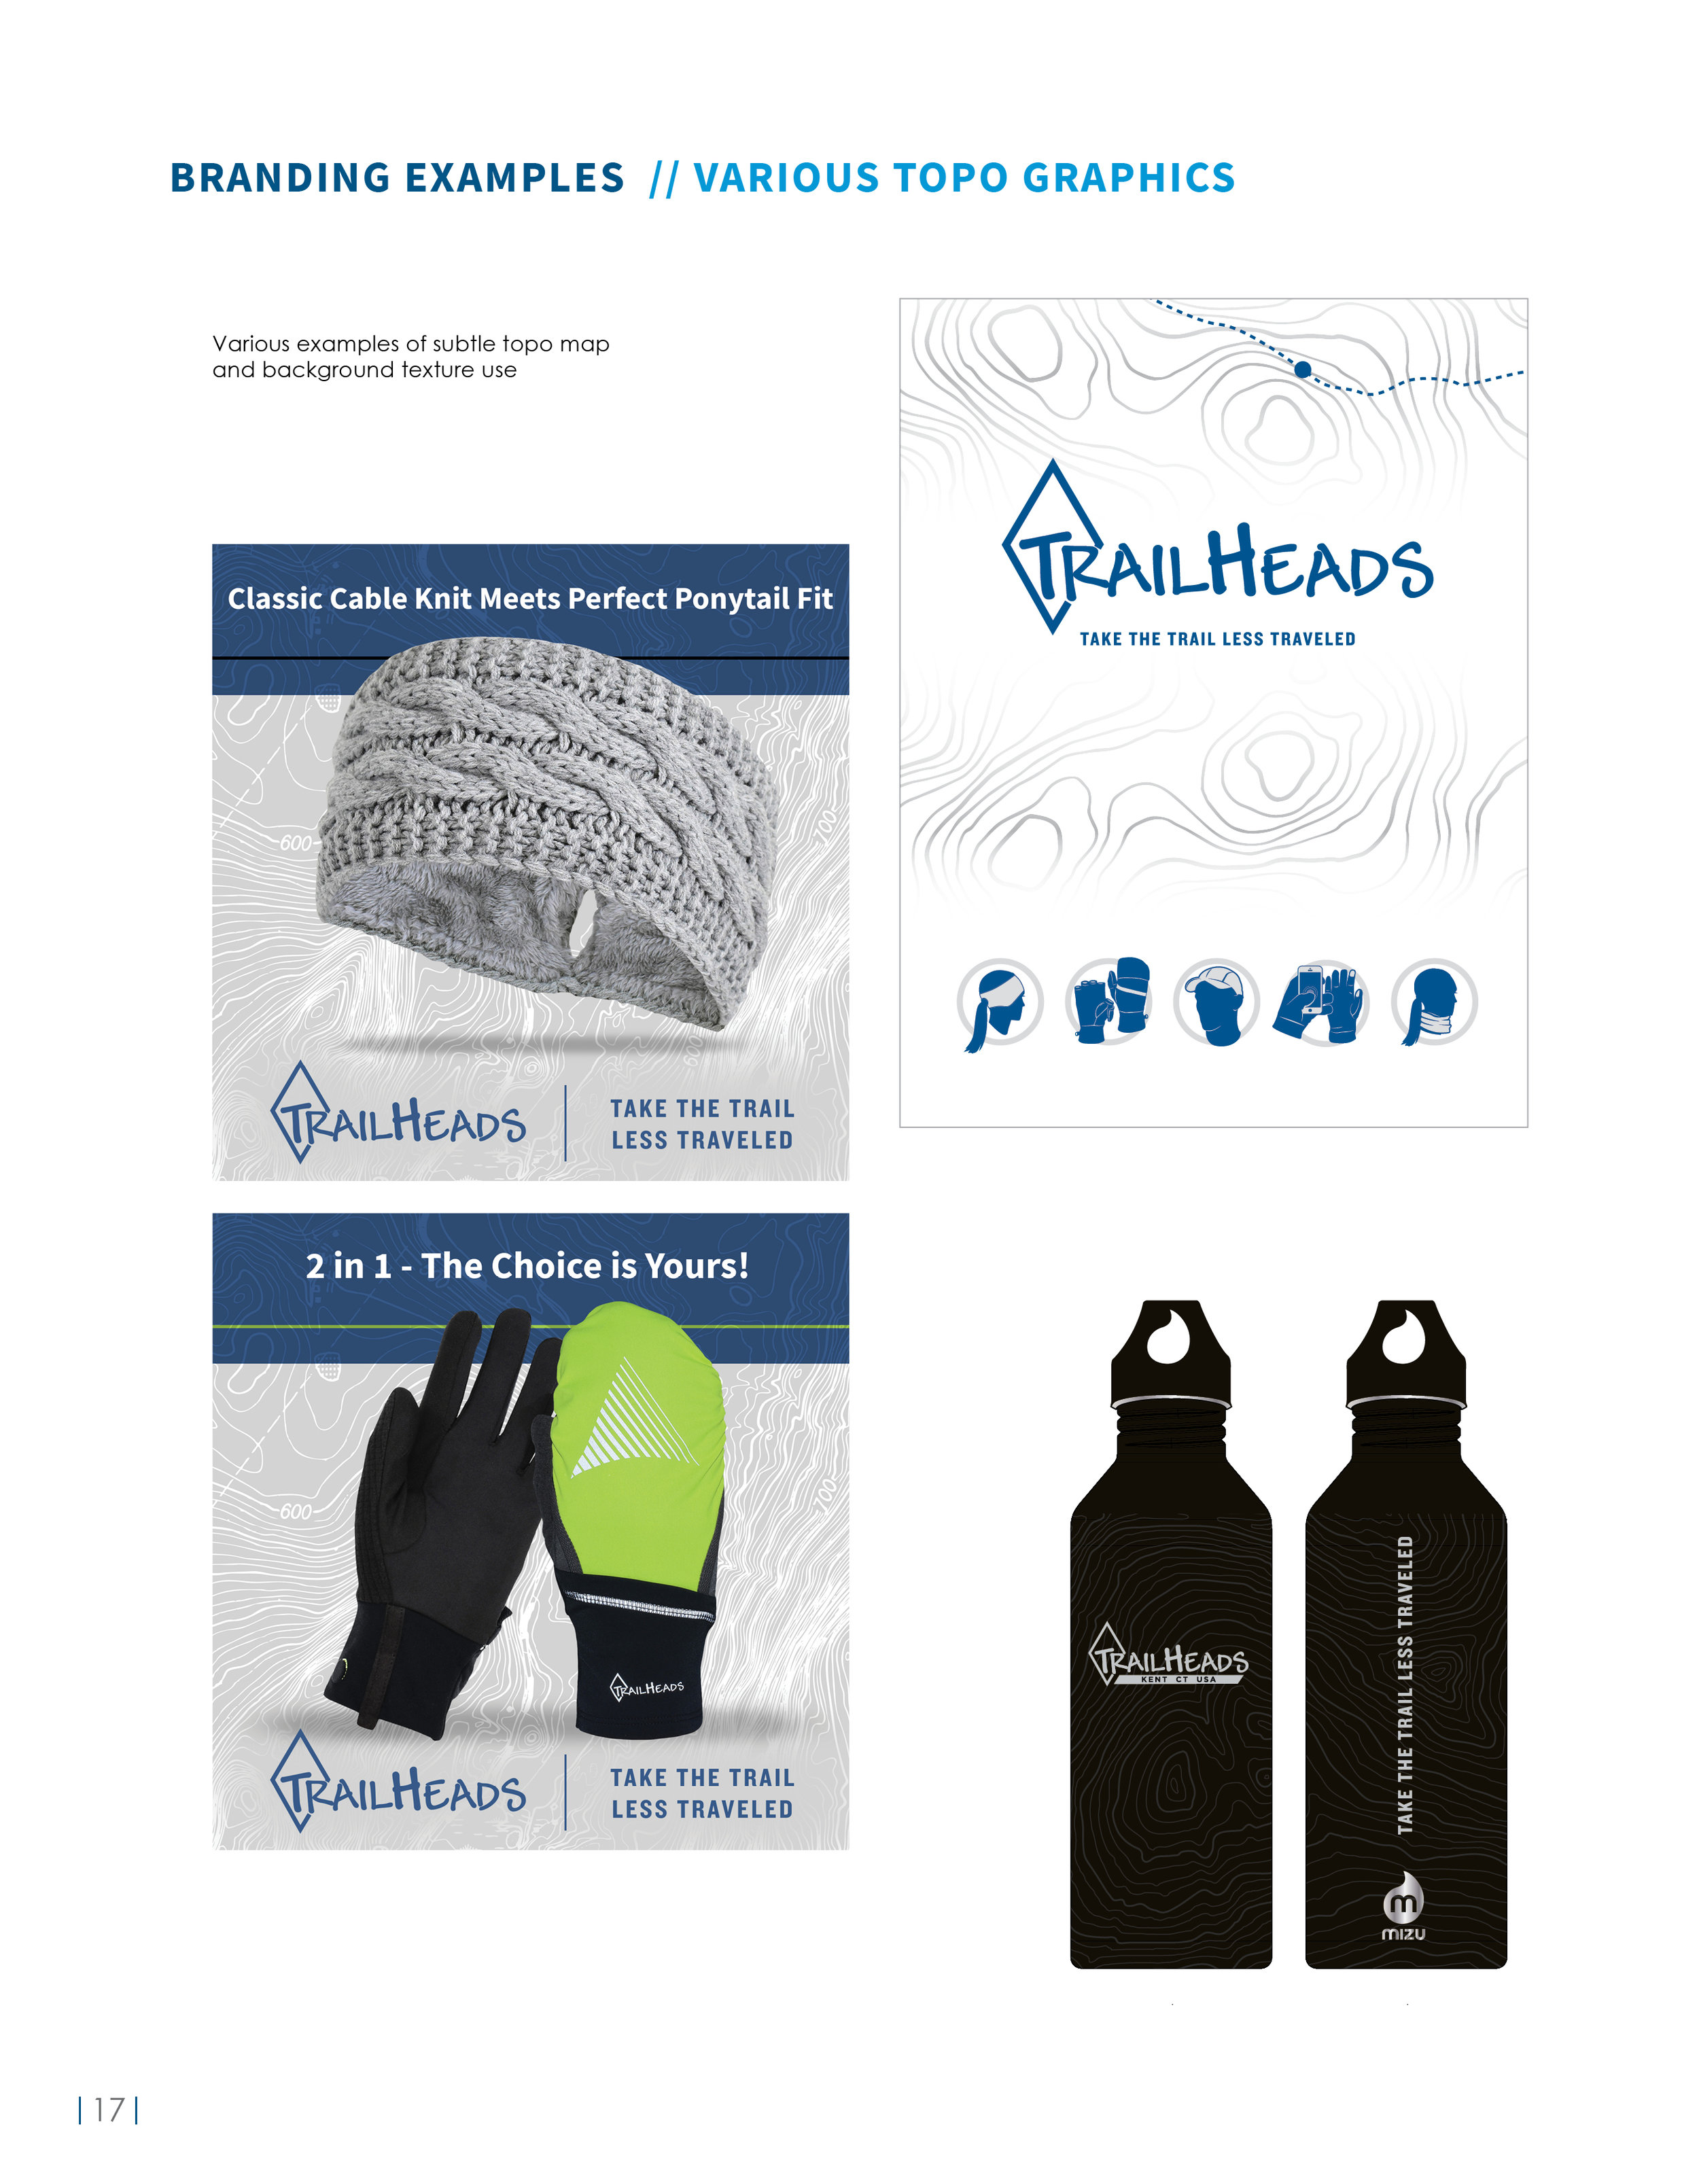 apparel-company-brand-guidelines-design-by-jordan-fretz-design-117.jpg